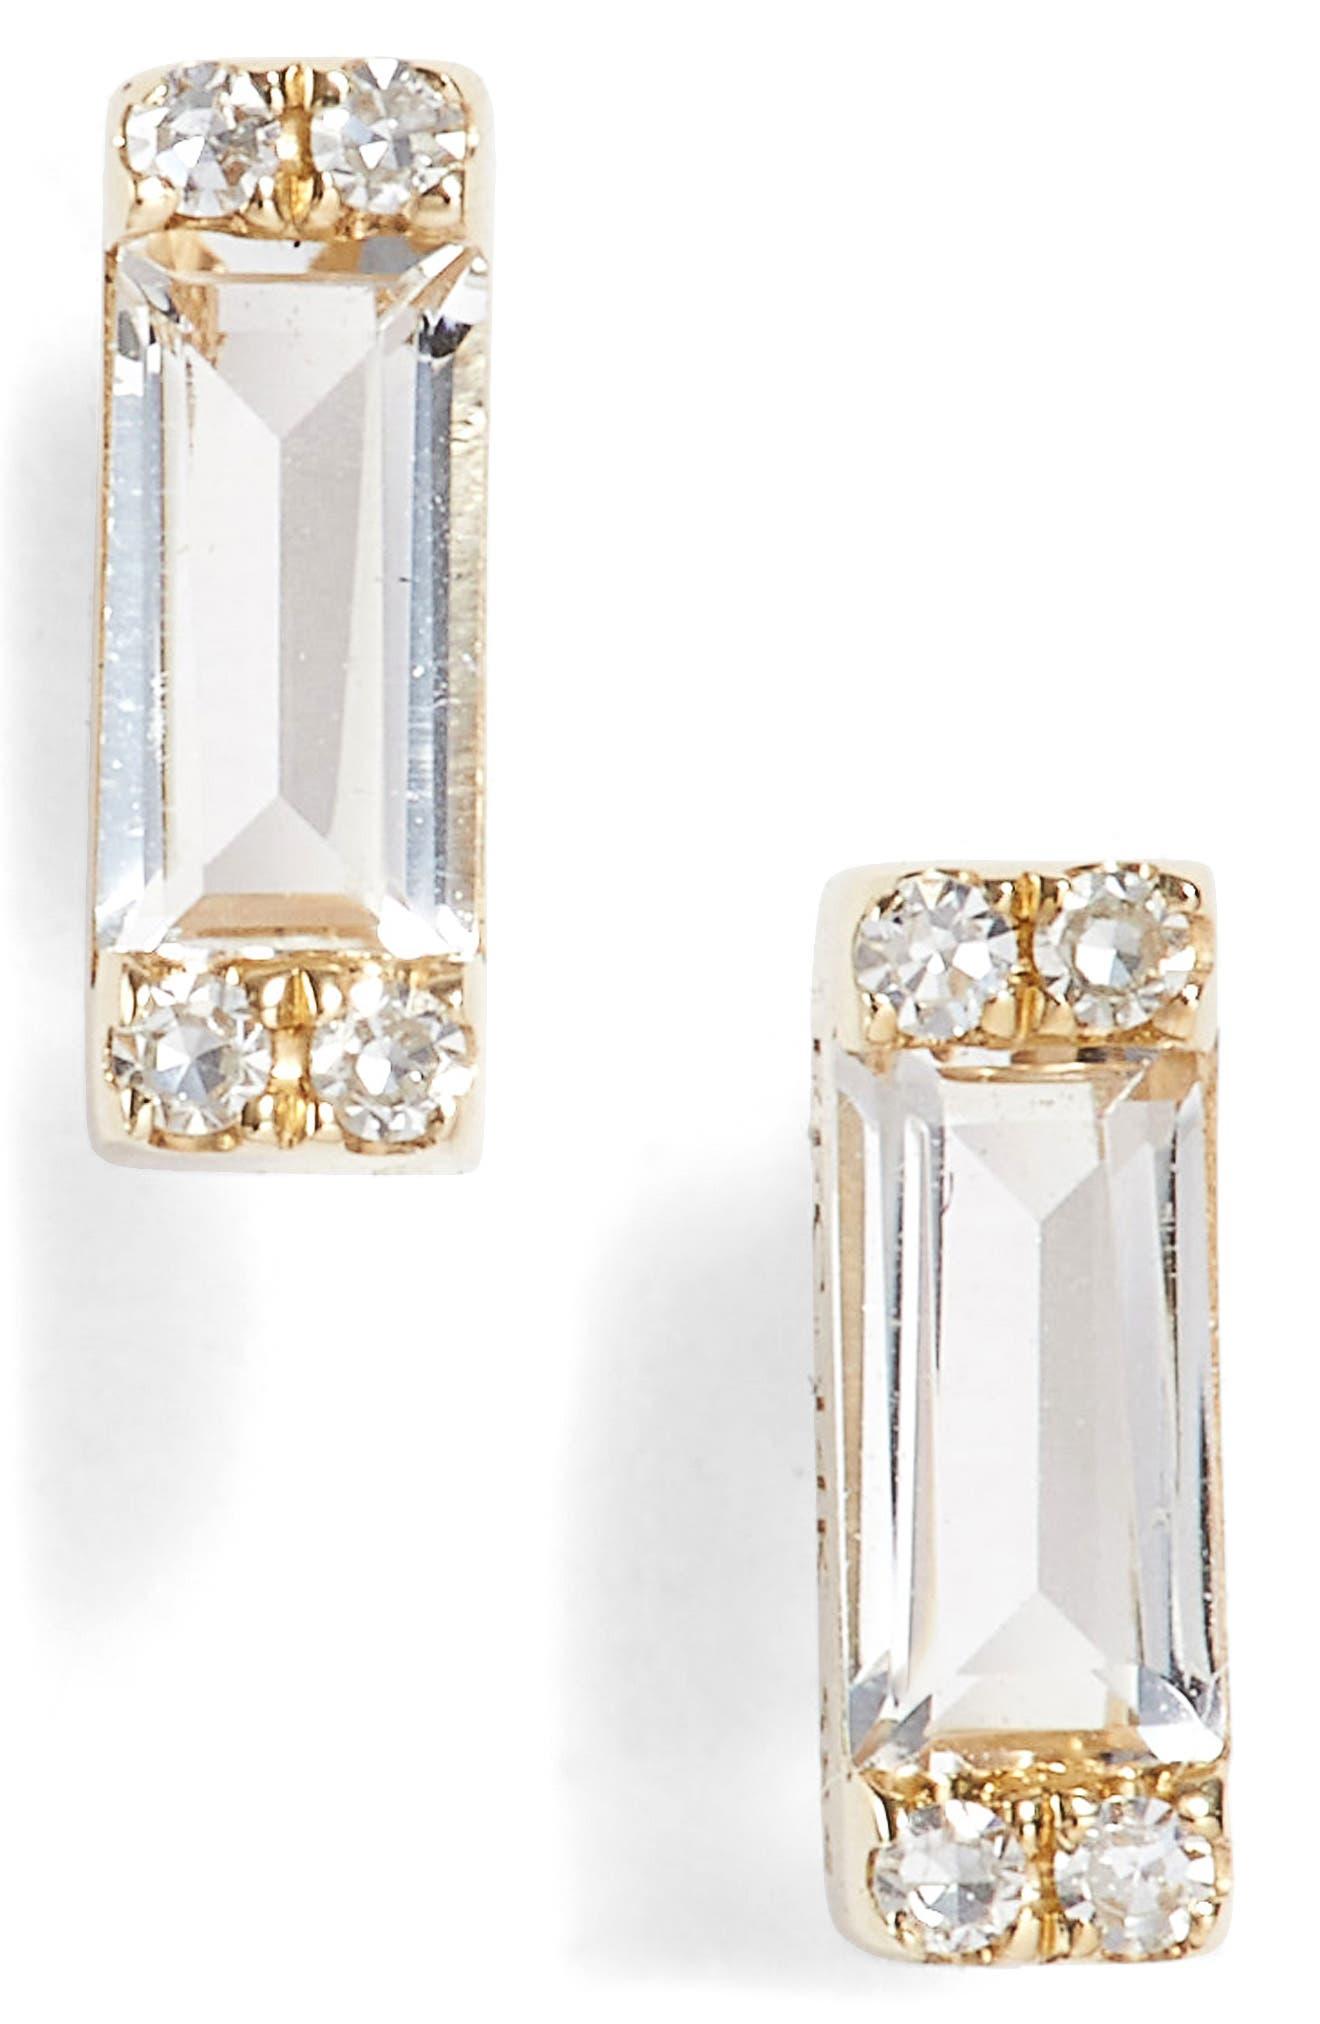 Diamond & Topaz Baguette Stud Earrings,                             Main thumbnail 1, color,                             710